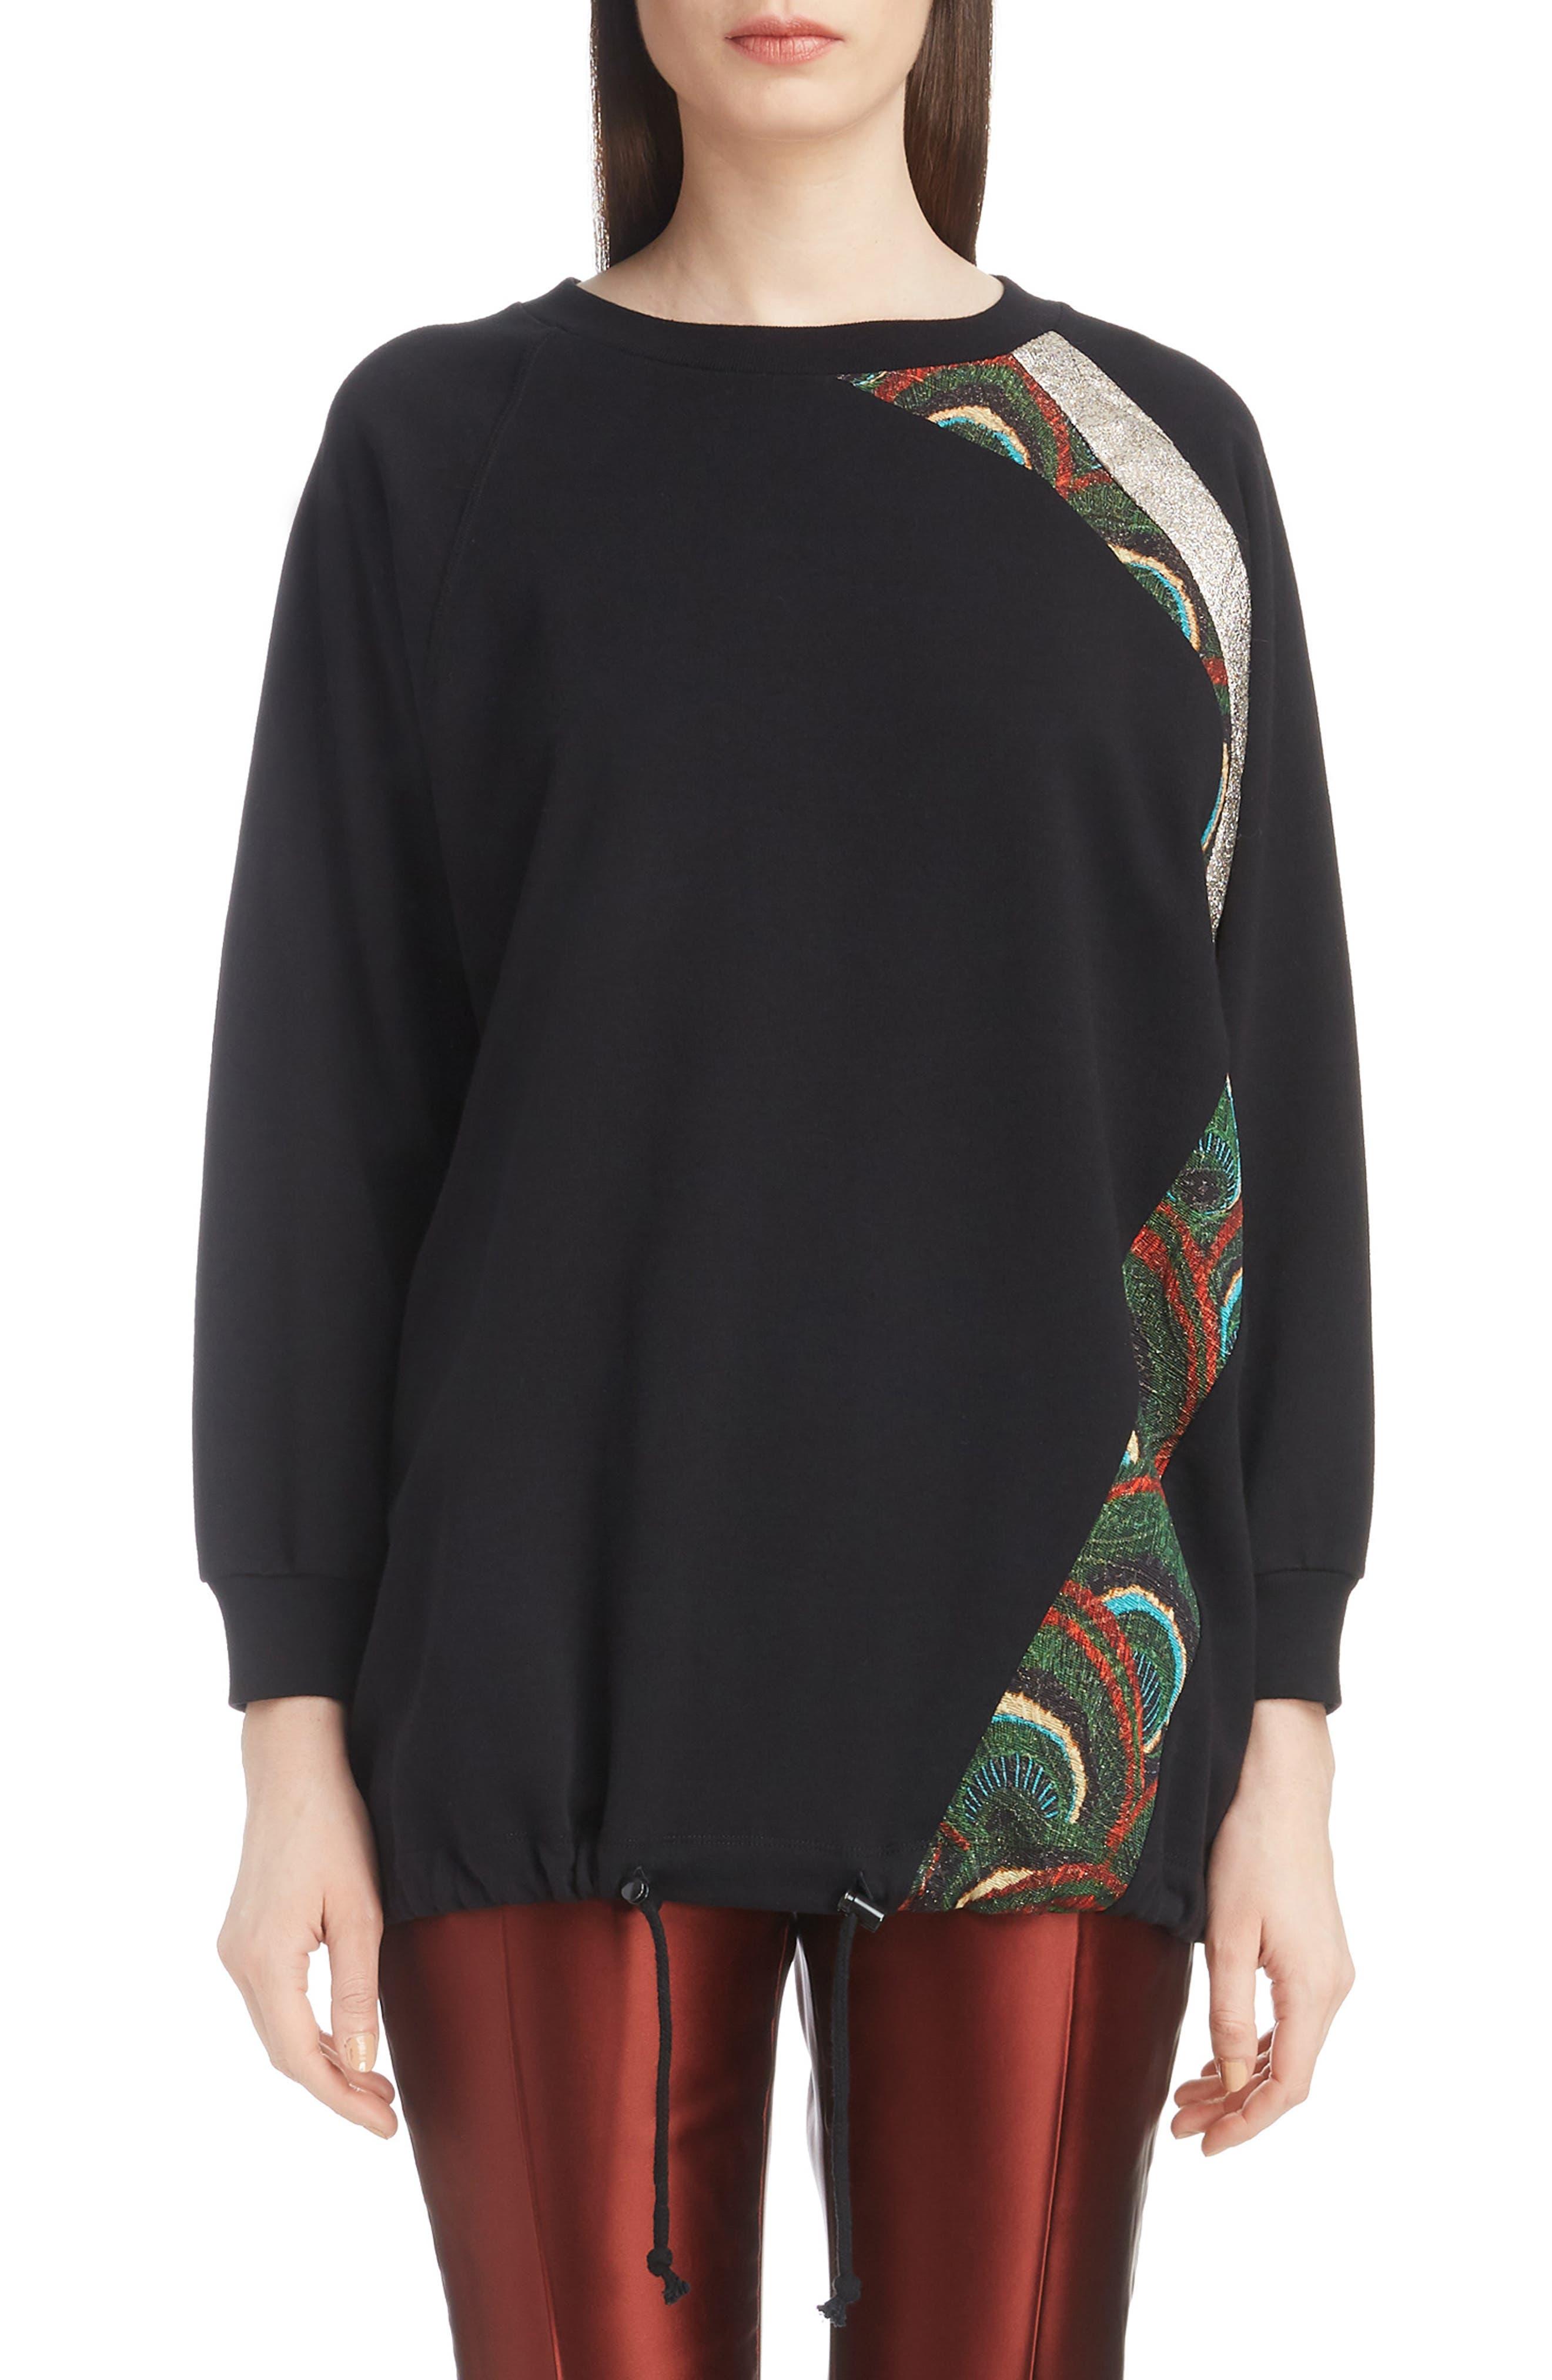 Metallic & Peacock Inset Sweatshirt,                             Main thumbnail 1, color,                             BLACK